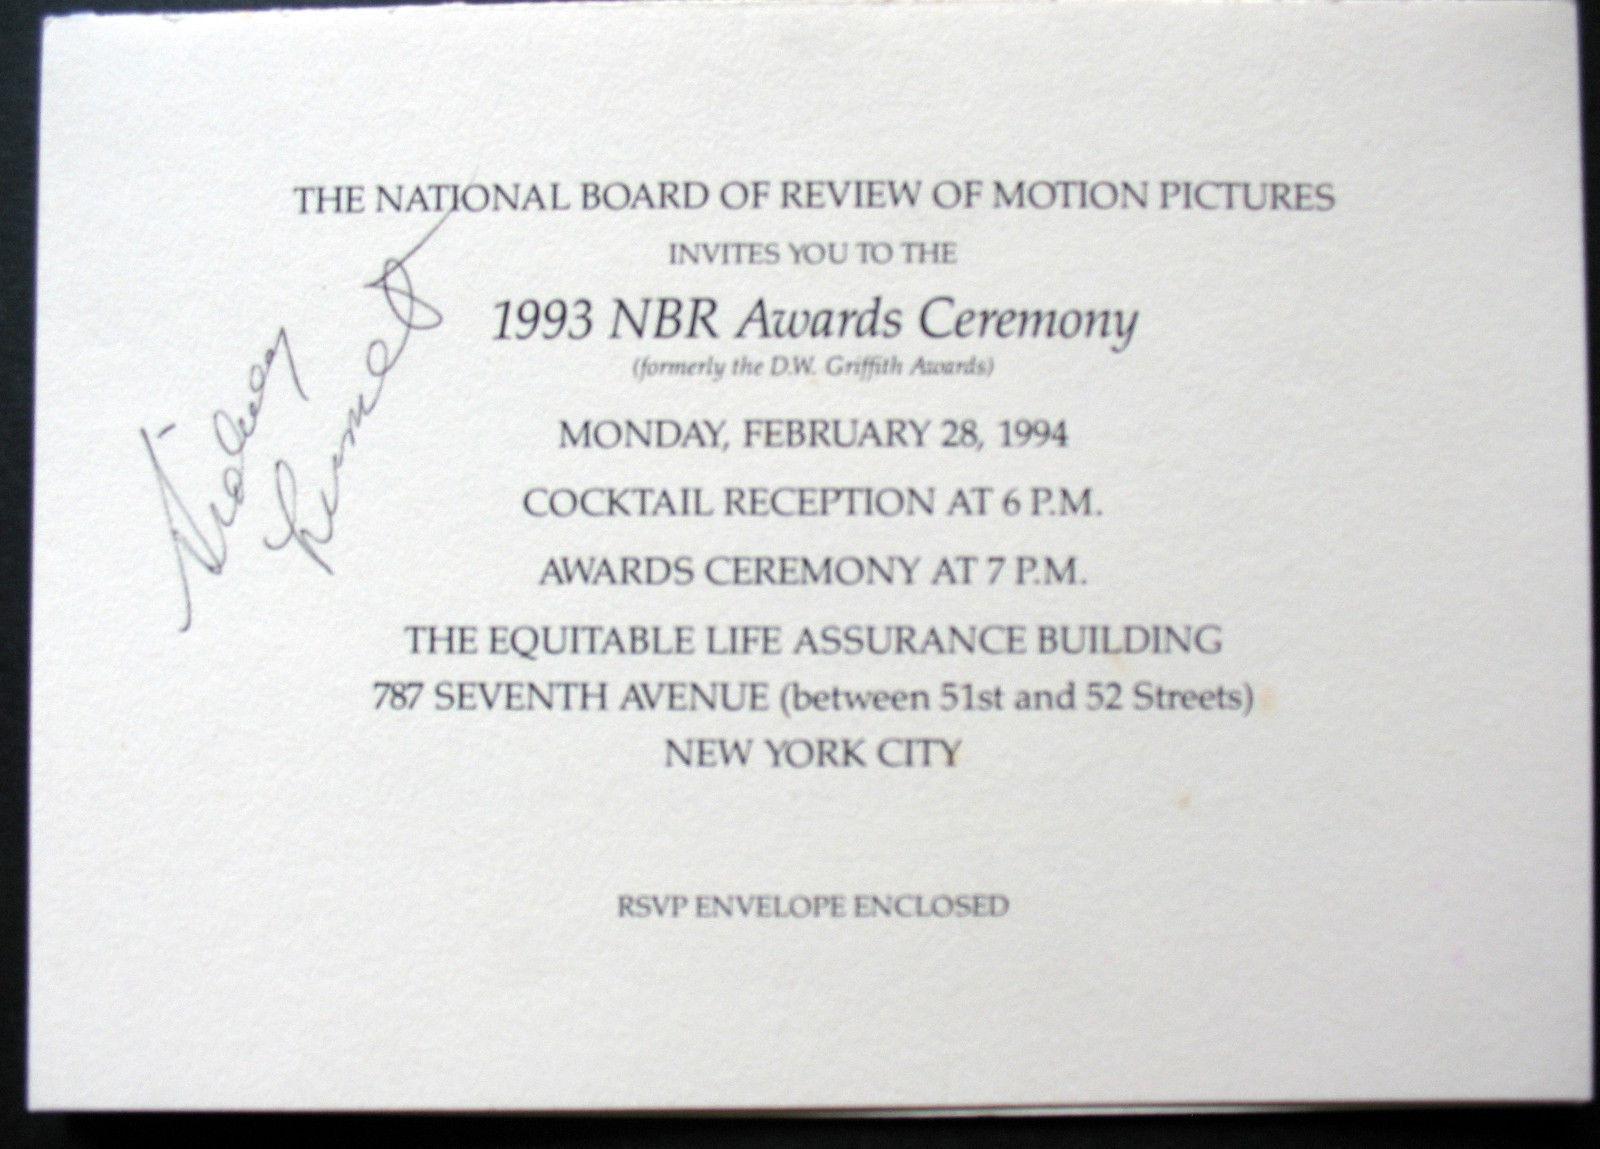 SIDNEY LUMET (ORIGINAL AUTOGRAPH) SIGN AT NBR AWARDS CEREMONY (CLASSIC)